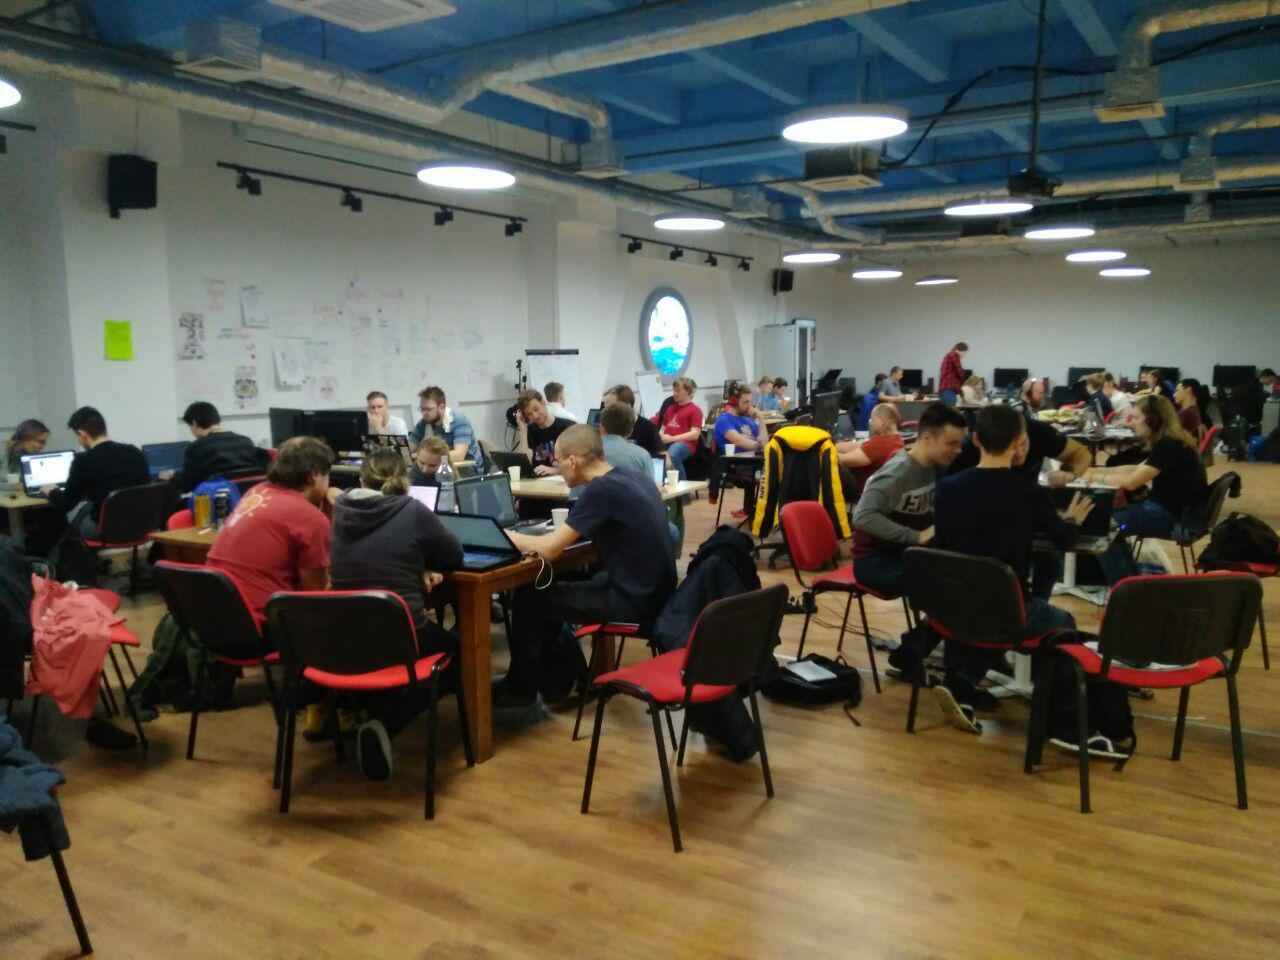 Офис полон участниками Ludum Dare